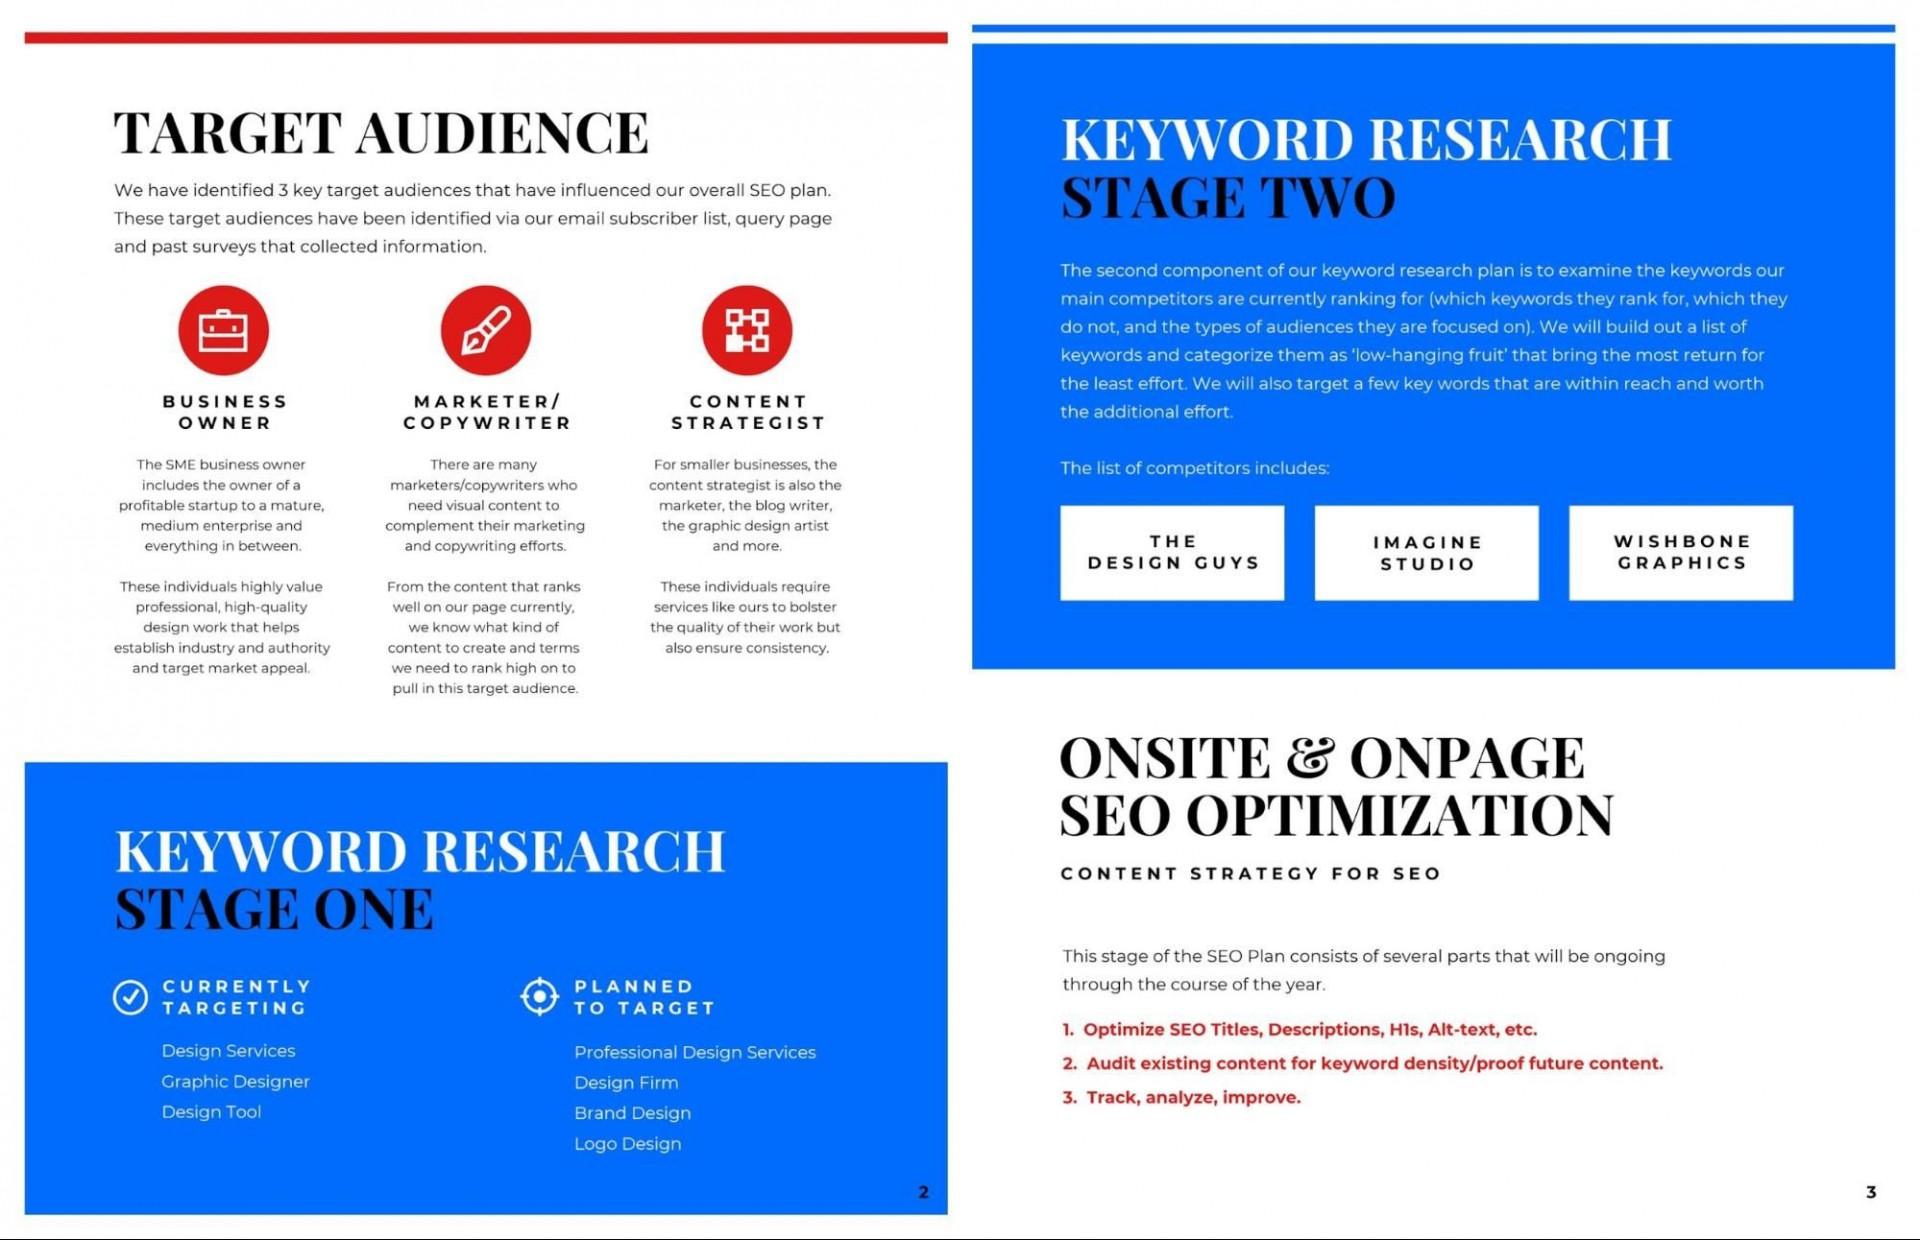 002 Awful Multi Level Marketing Busines Plan Template Idea  Network Pdf1920